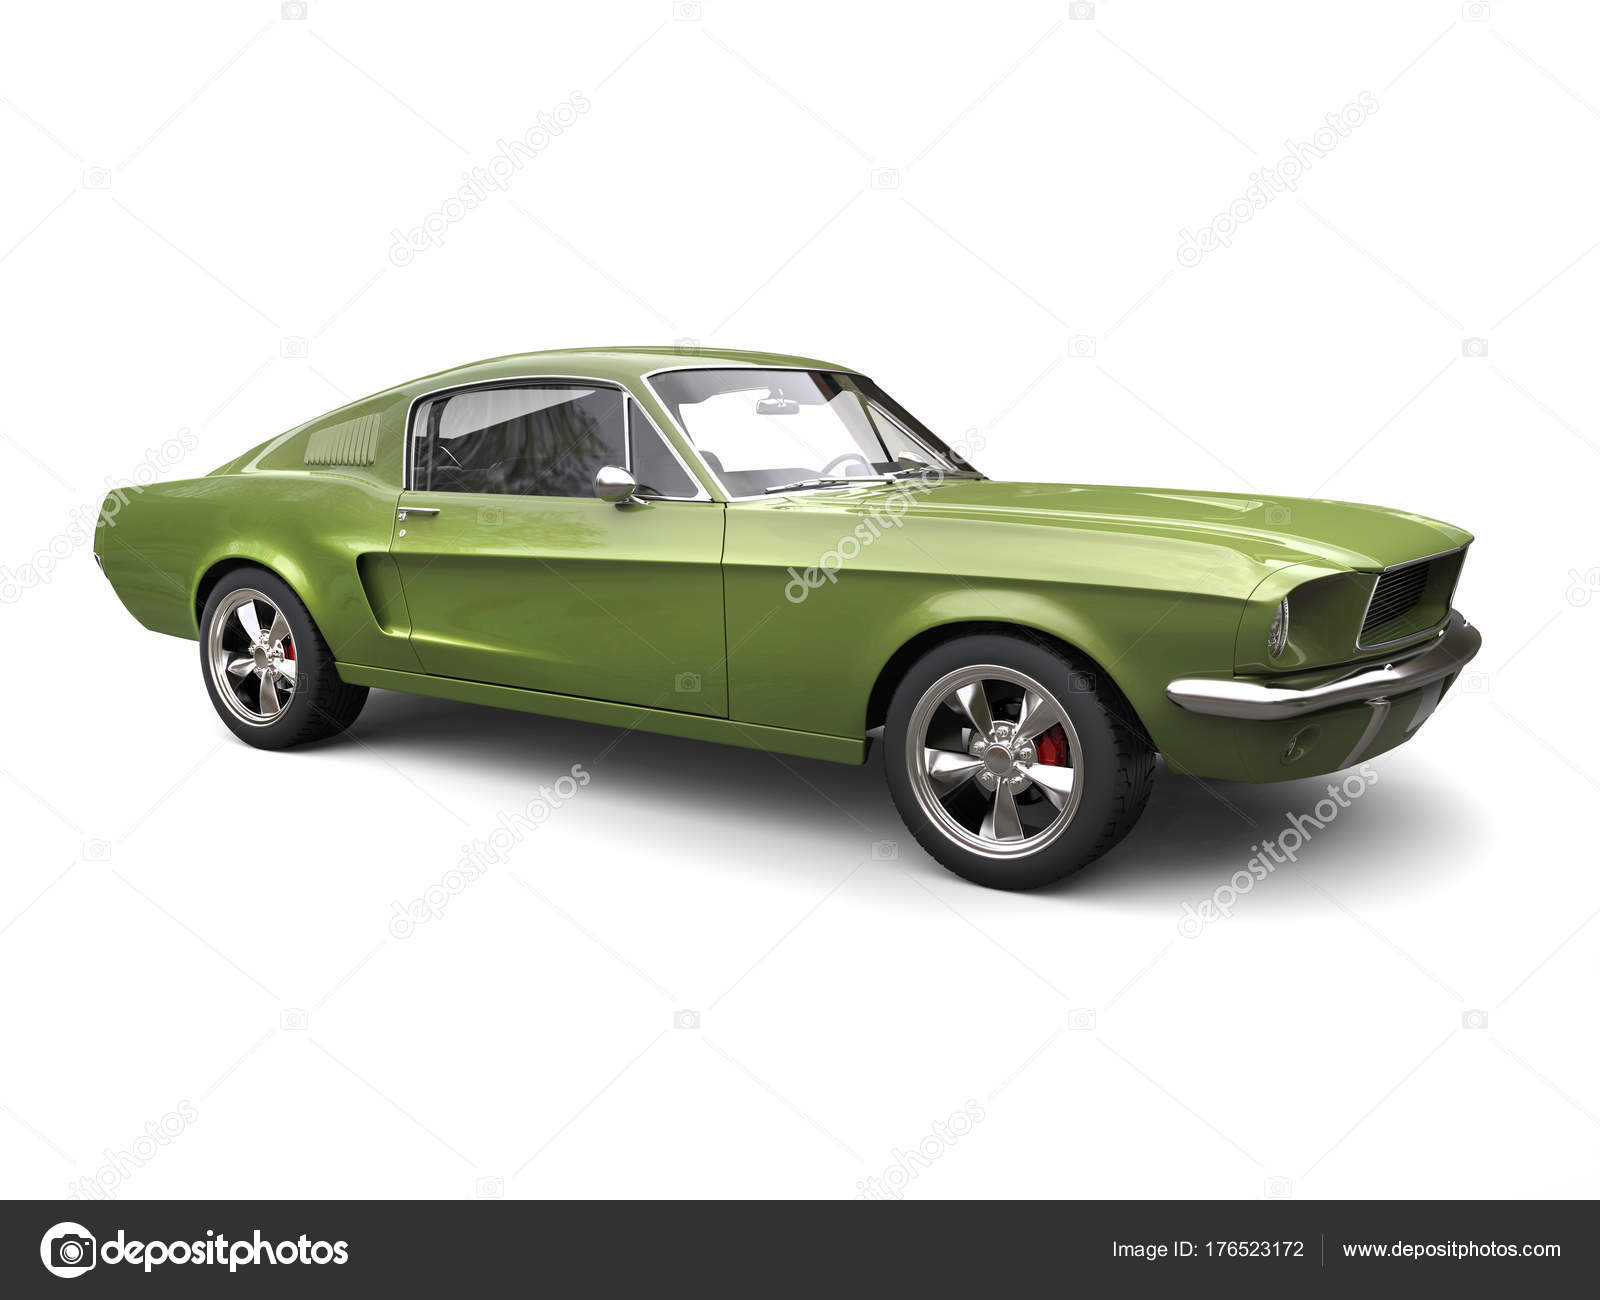 große amerikanische oldtimer muscle car hellen armee grün